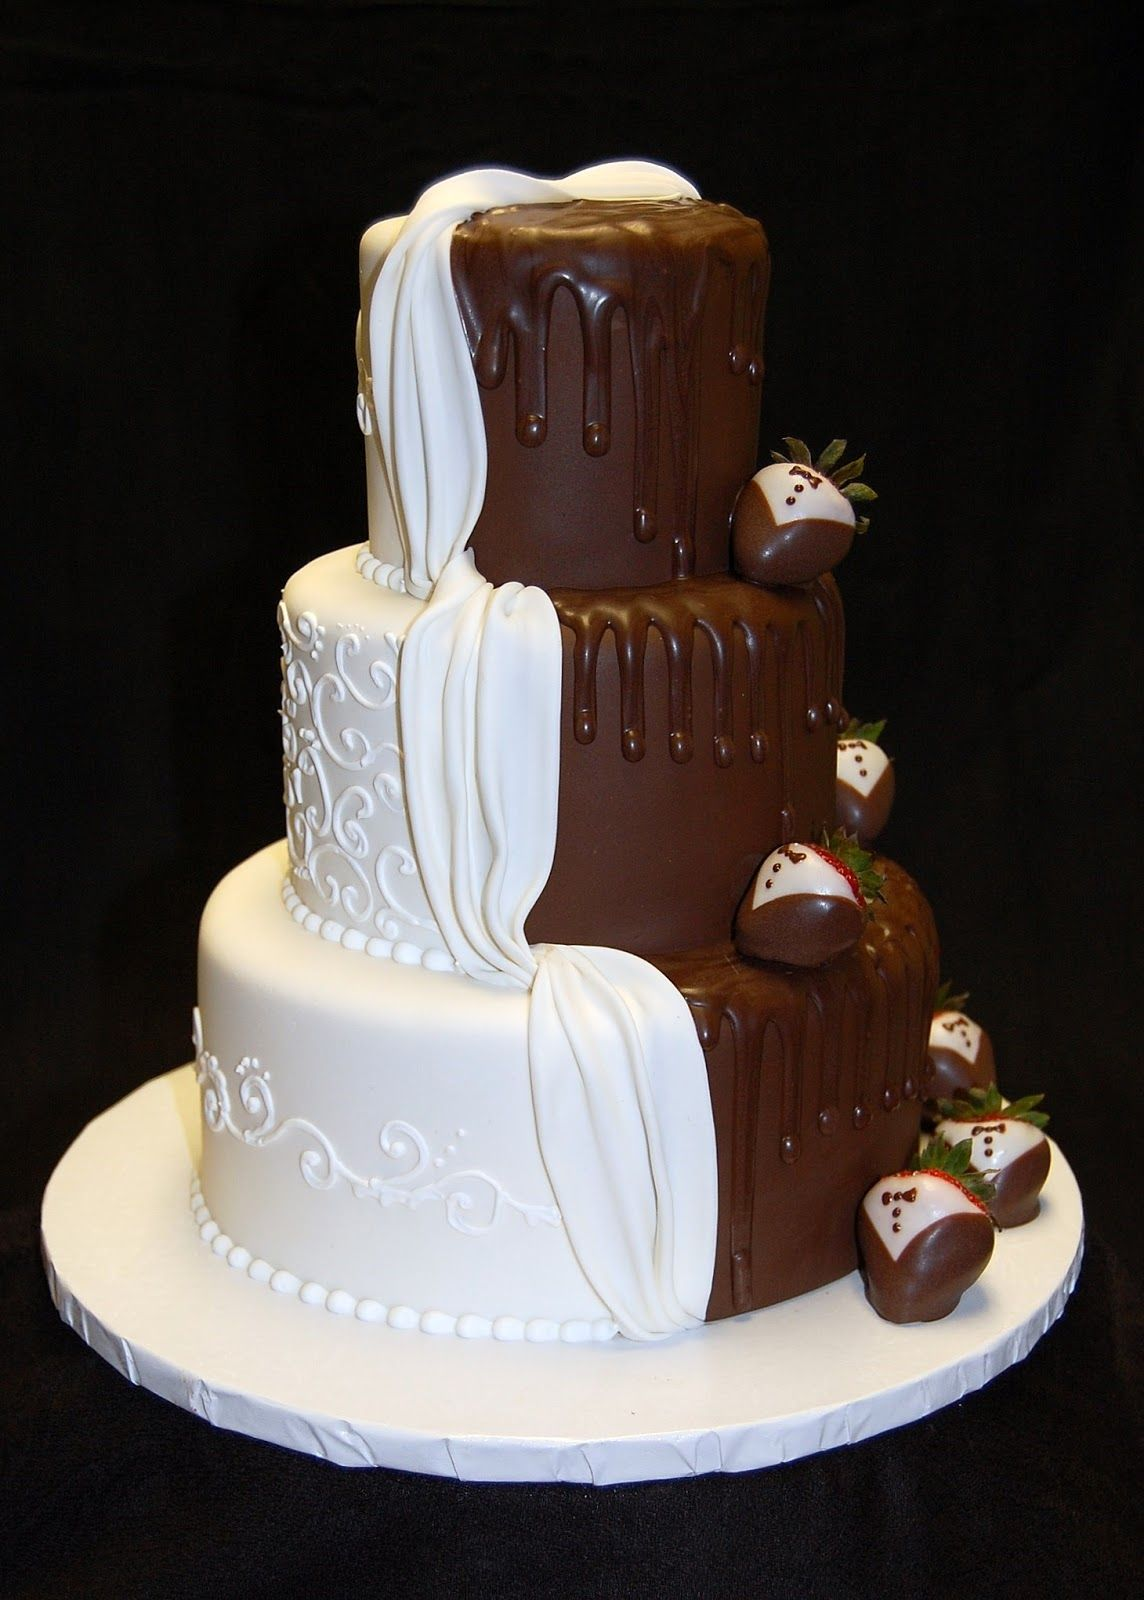 Bride and Groom Cake Together Bride26GroomWeddingCake281